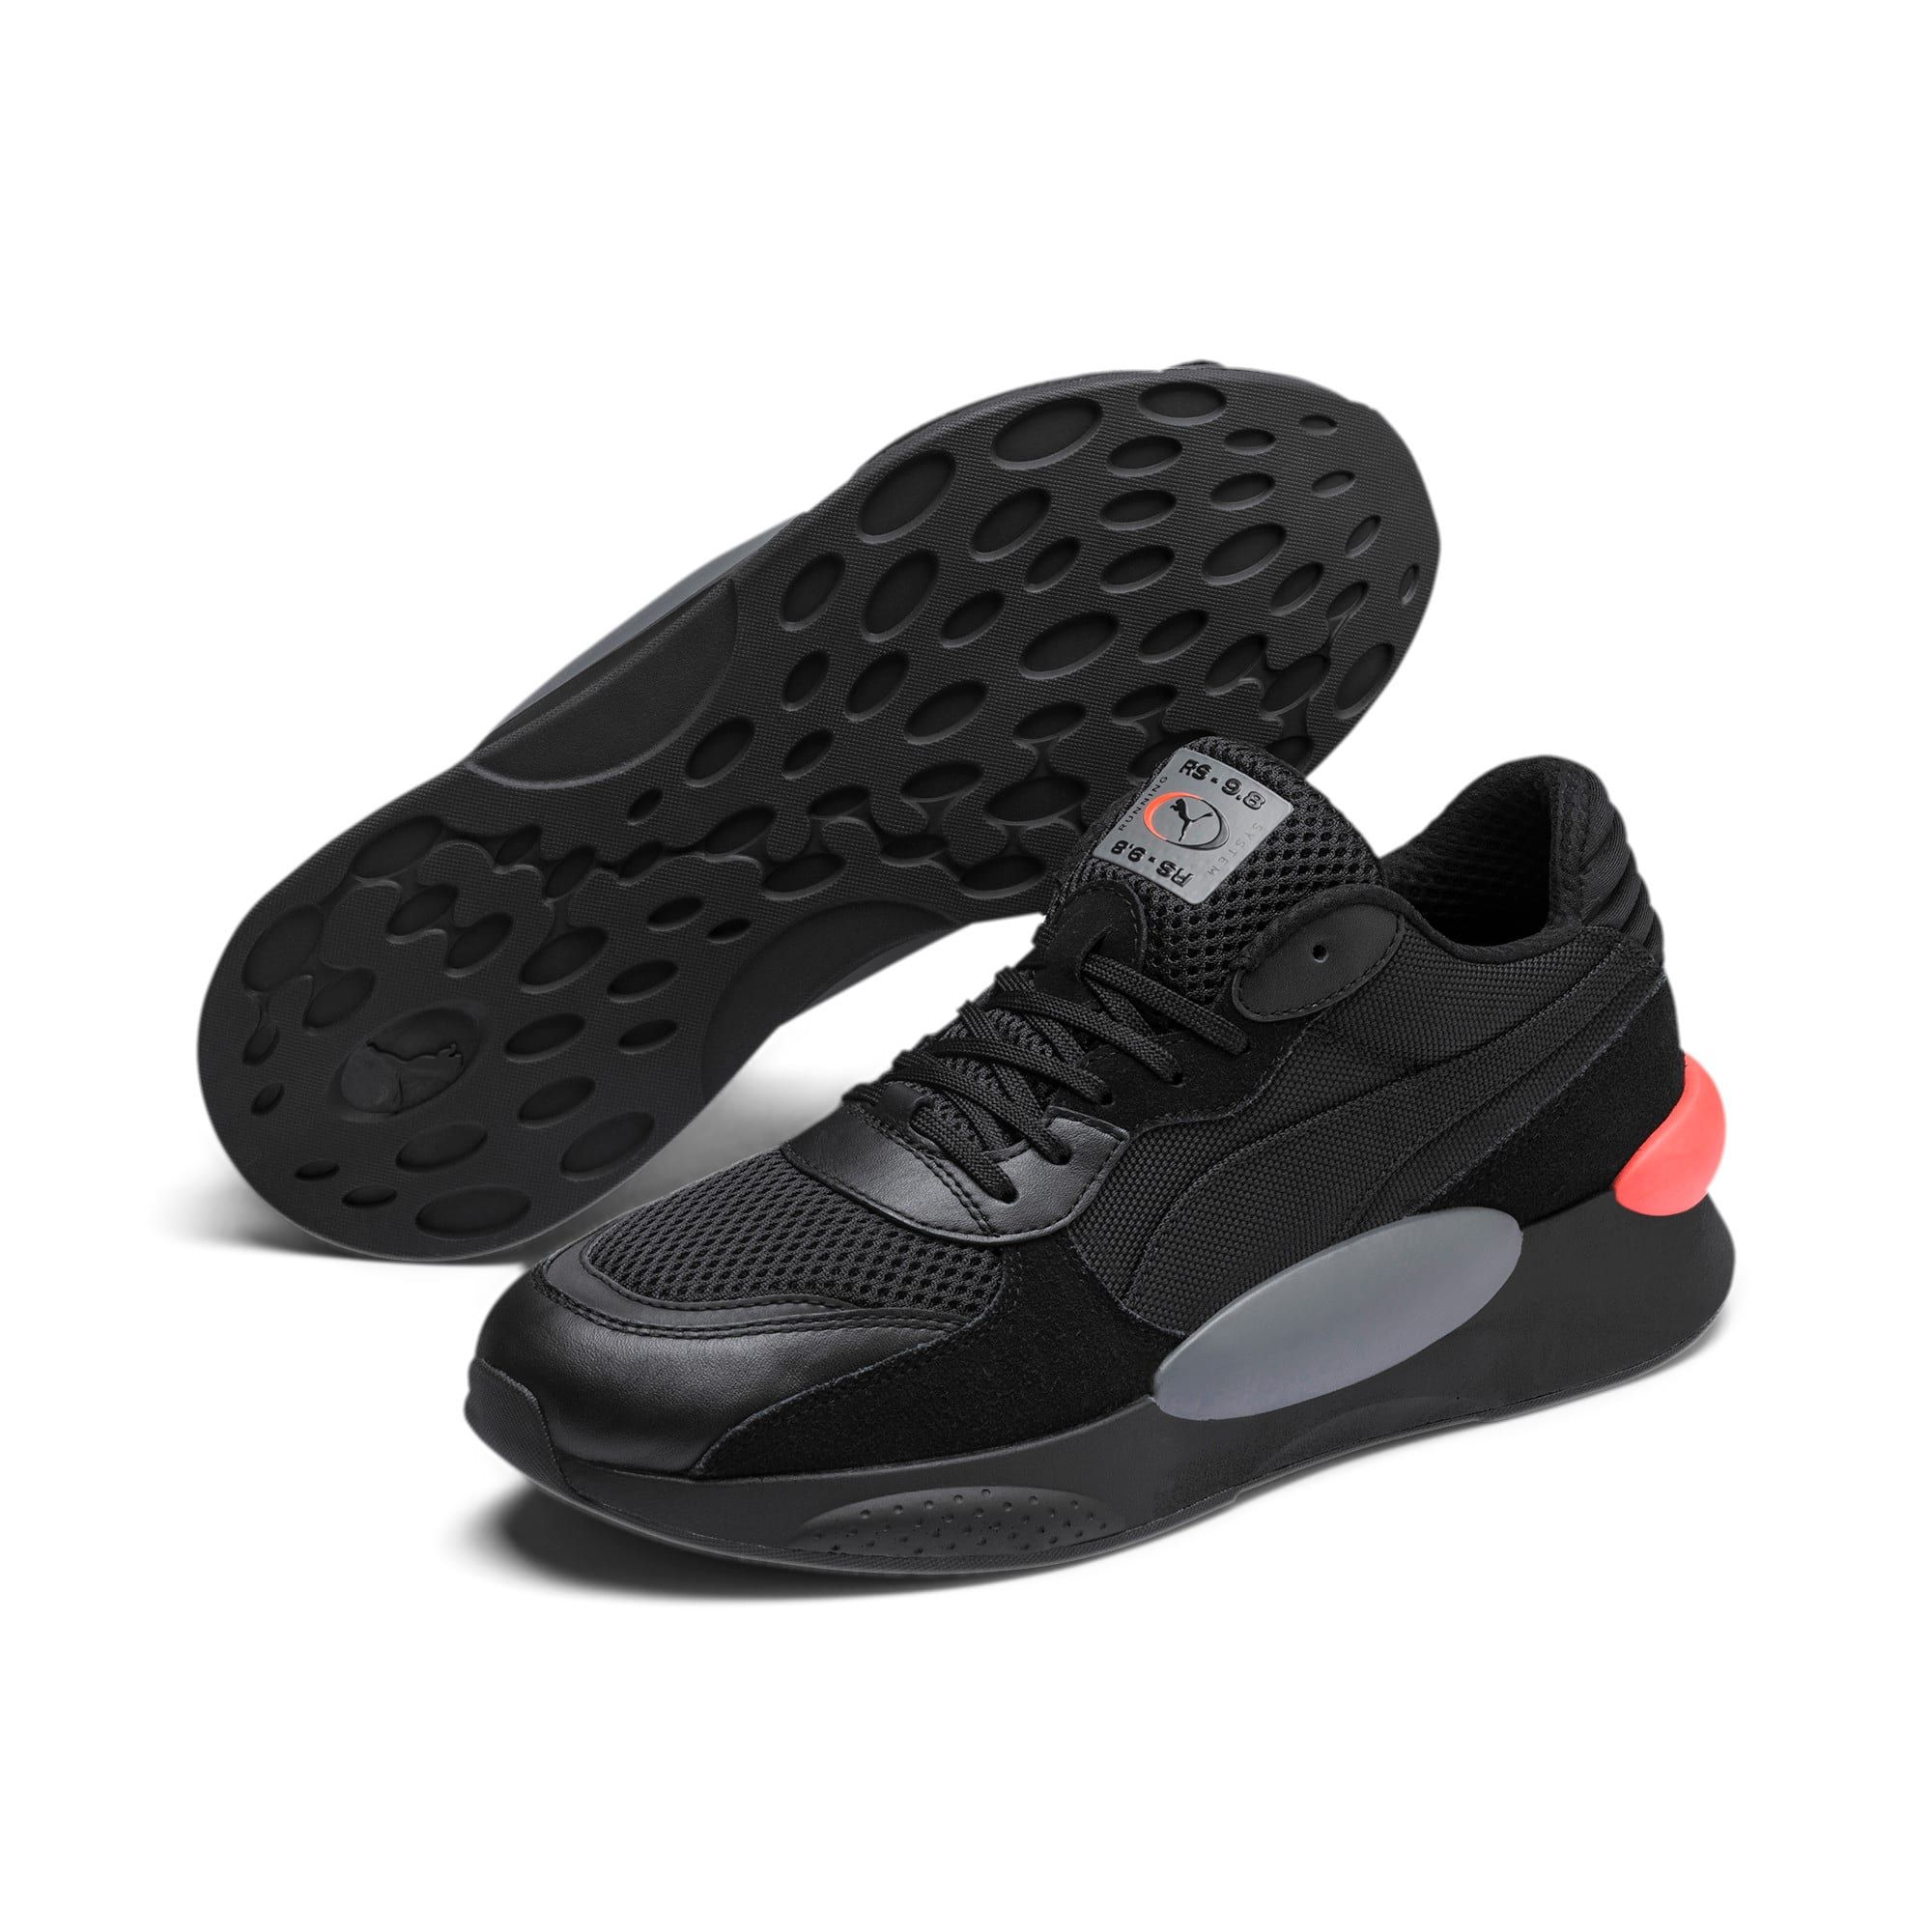 Thumbnail 2 of RS 9.8 Cosmic Sneakers, Puma Black, medium